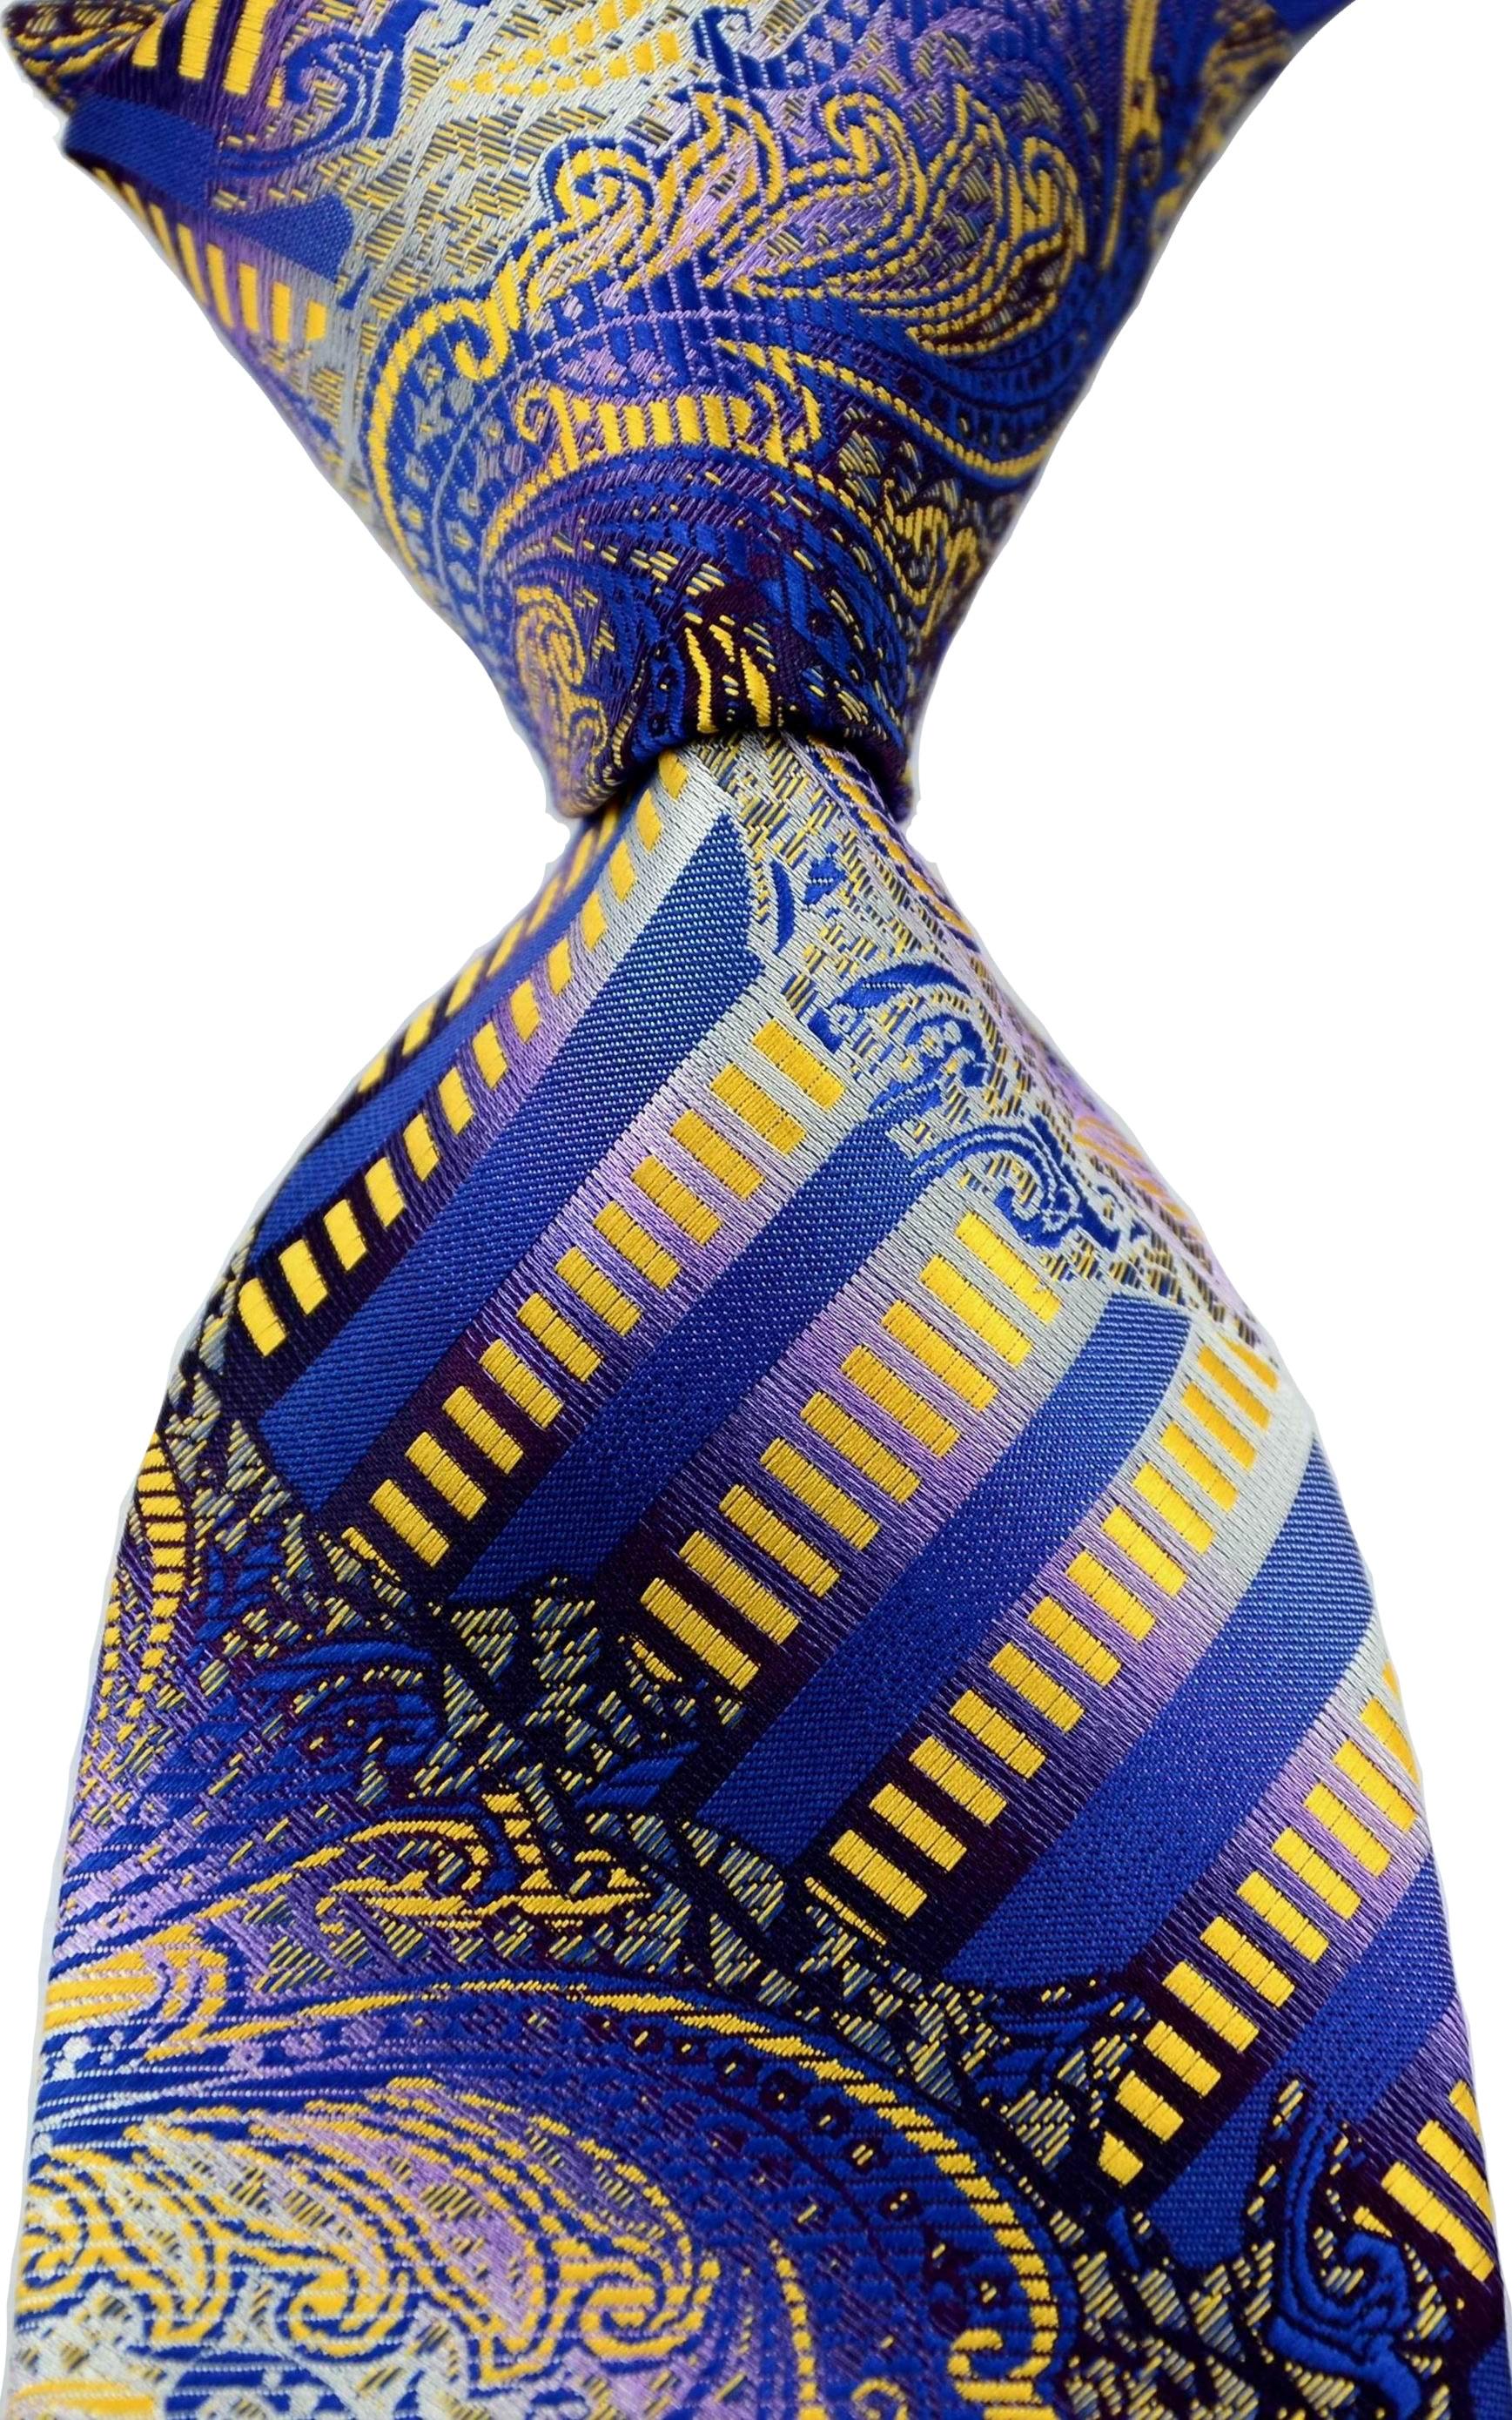 Fashion Neckties Classic Men's Striped Paisley Blue Gold Red Wedding Ties Jacquard Woven 100% Silk Men Neck Ties